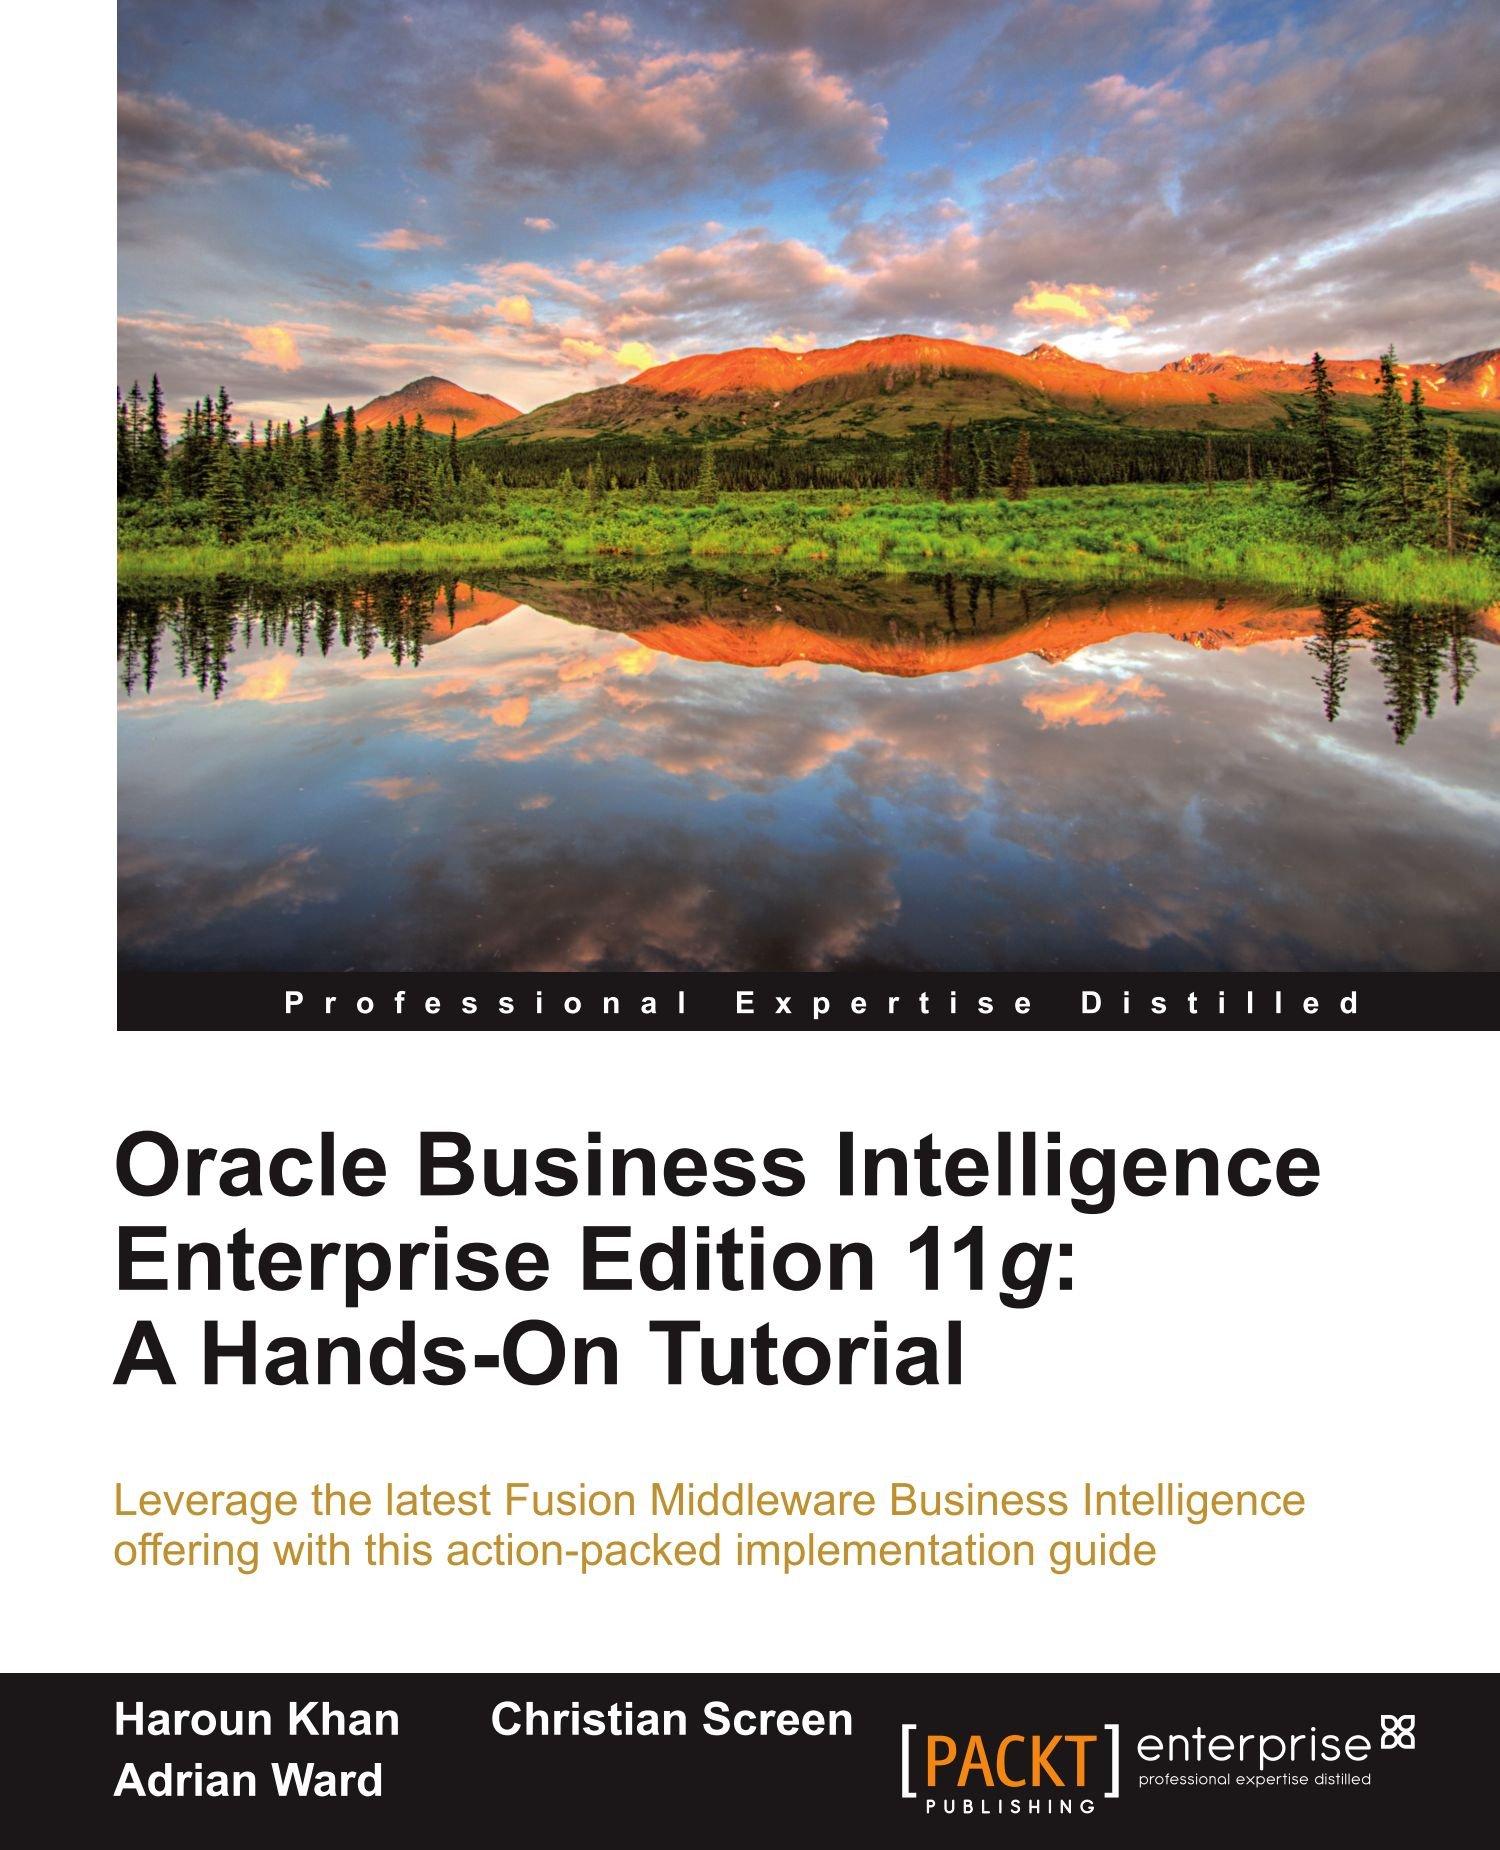 Oracle Business Intelligence Enterprise Edition 11g: A Hands-On Tutorial:  Christian Screen, Haroun Khan, Adrian Ward: 9781849685665: Amazon.com: Books